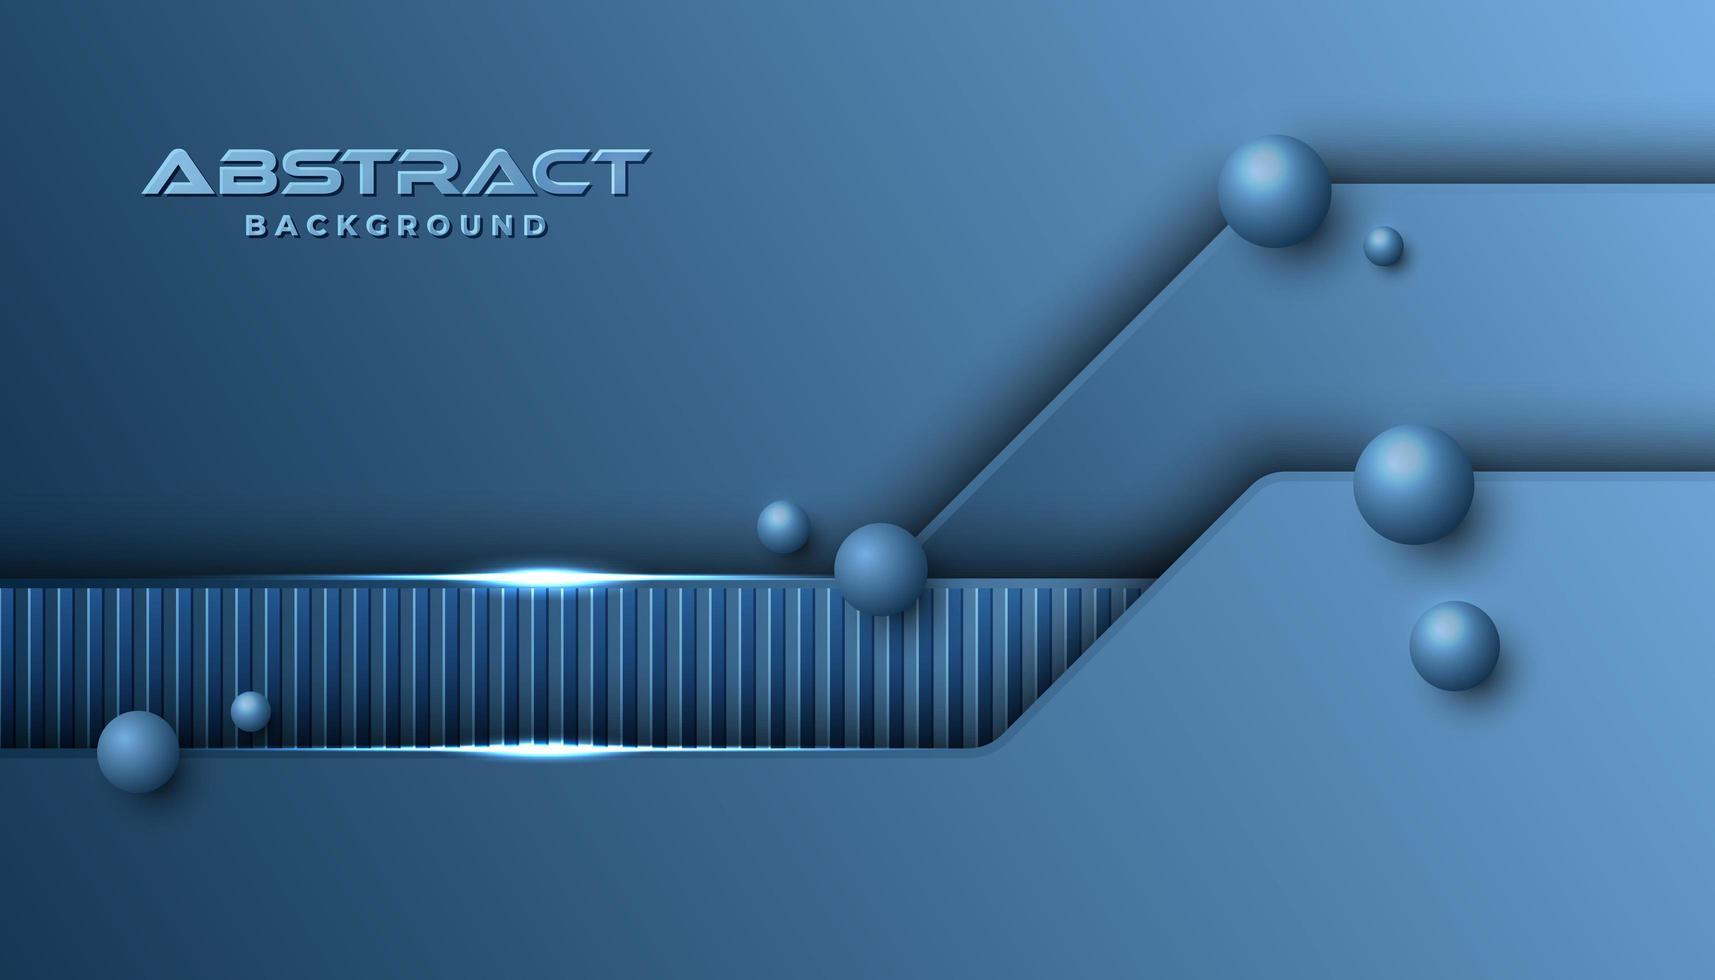 Fondo de formas en capas futurista azul clásico vector